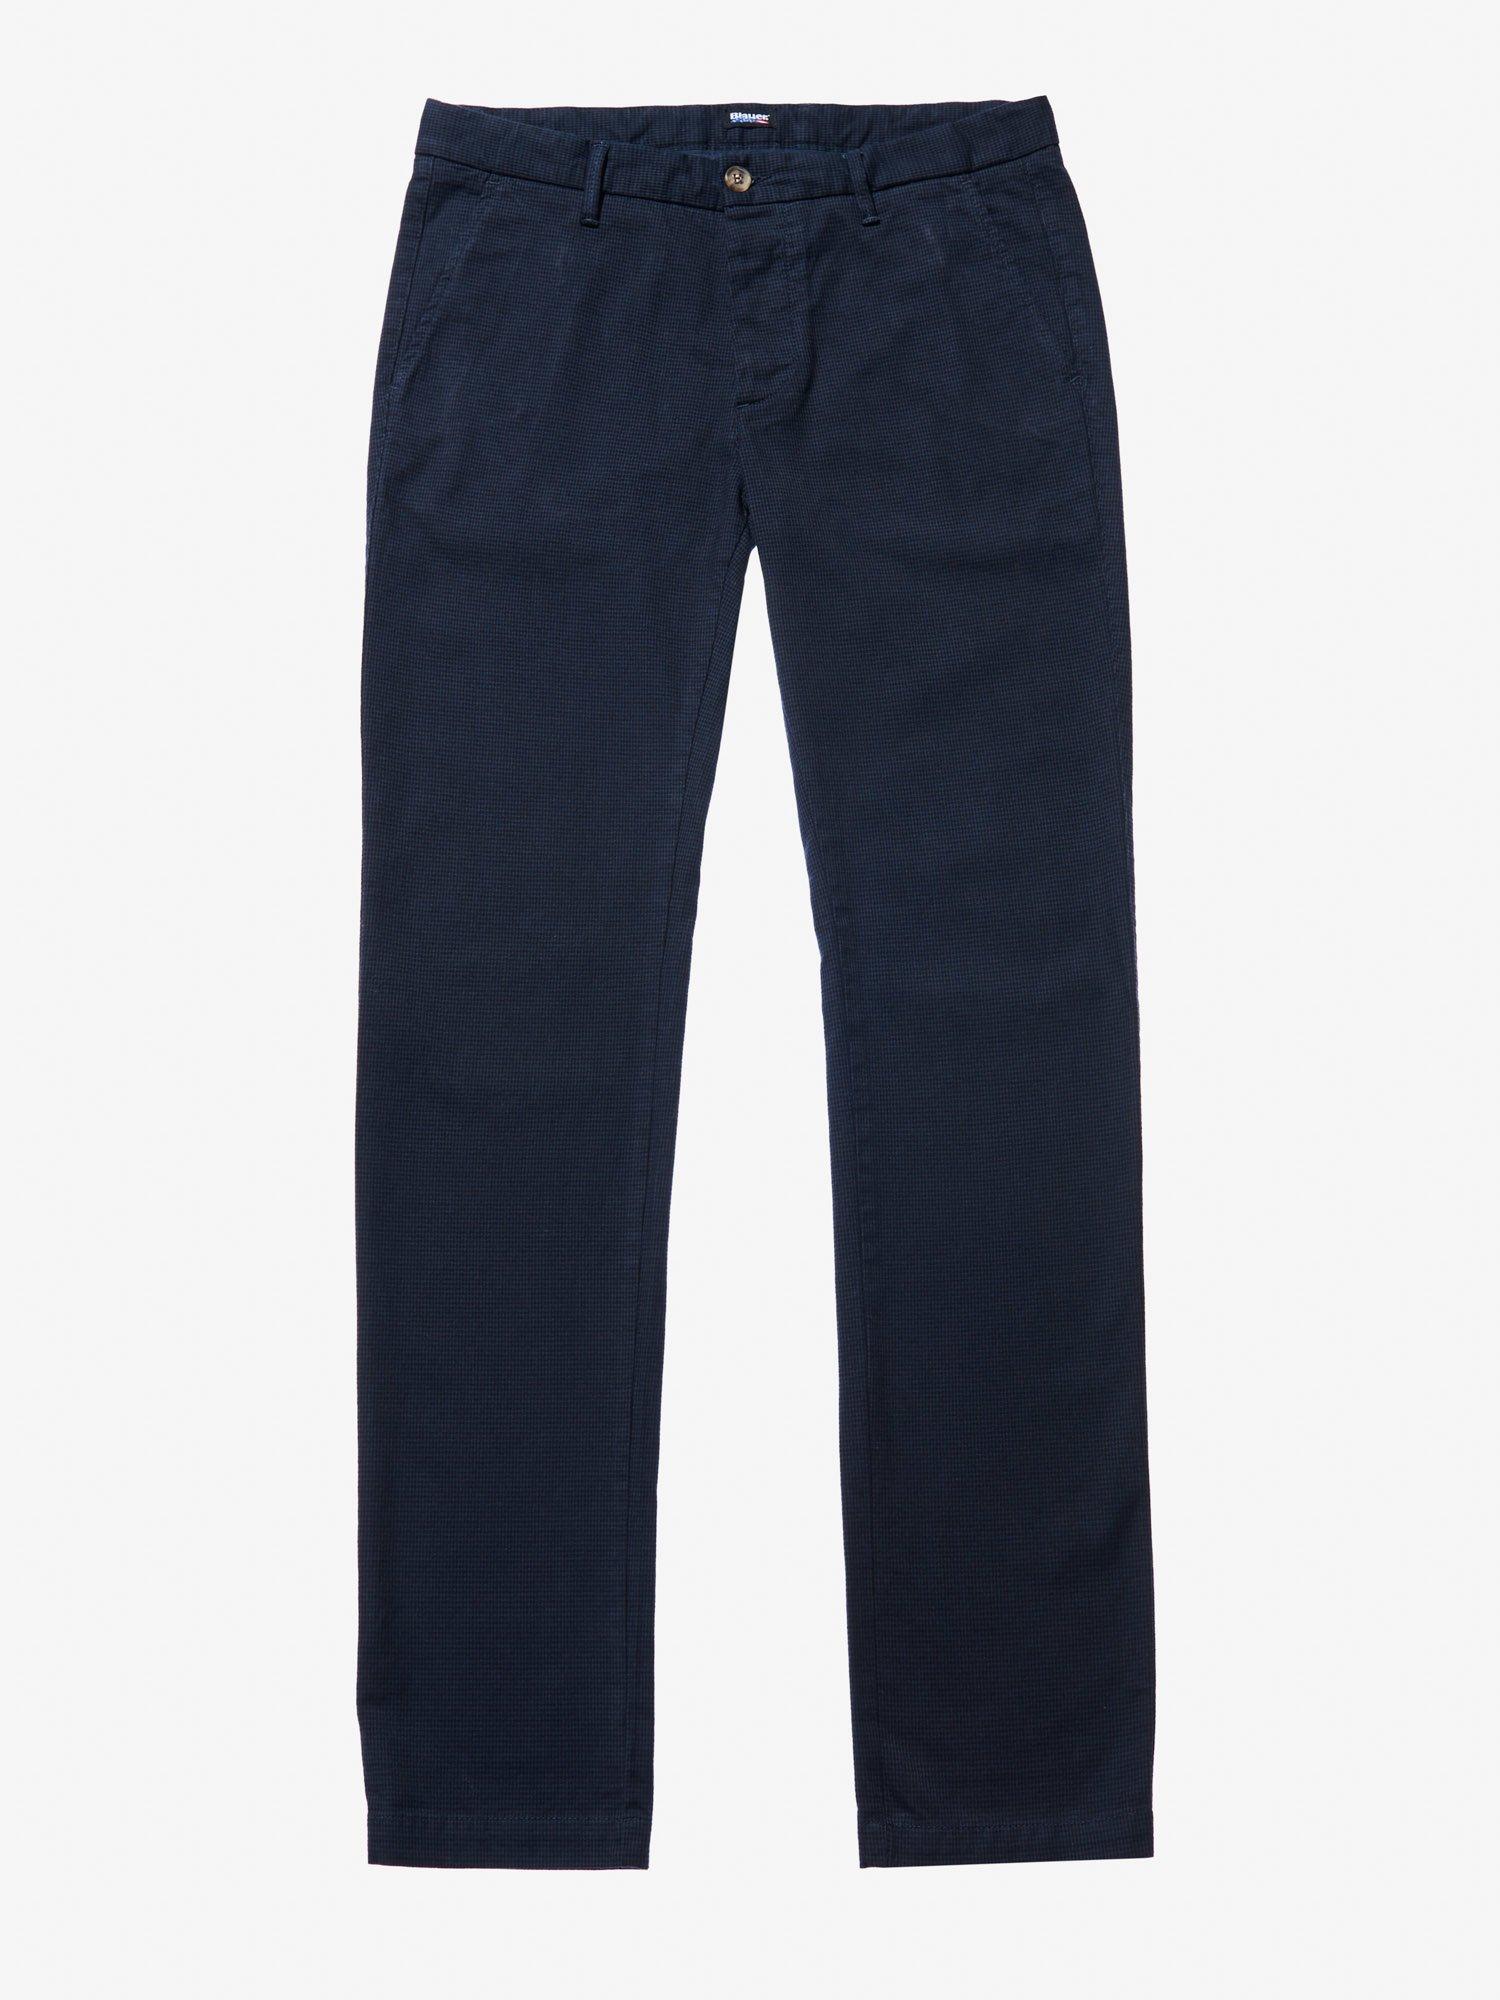 fac755c27 Houndstooth Gabardine Pants